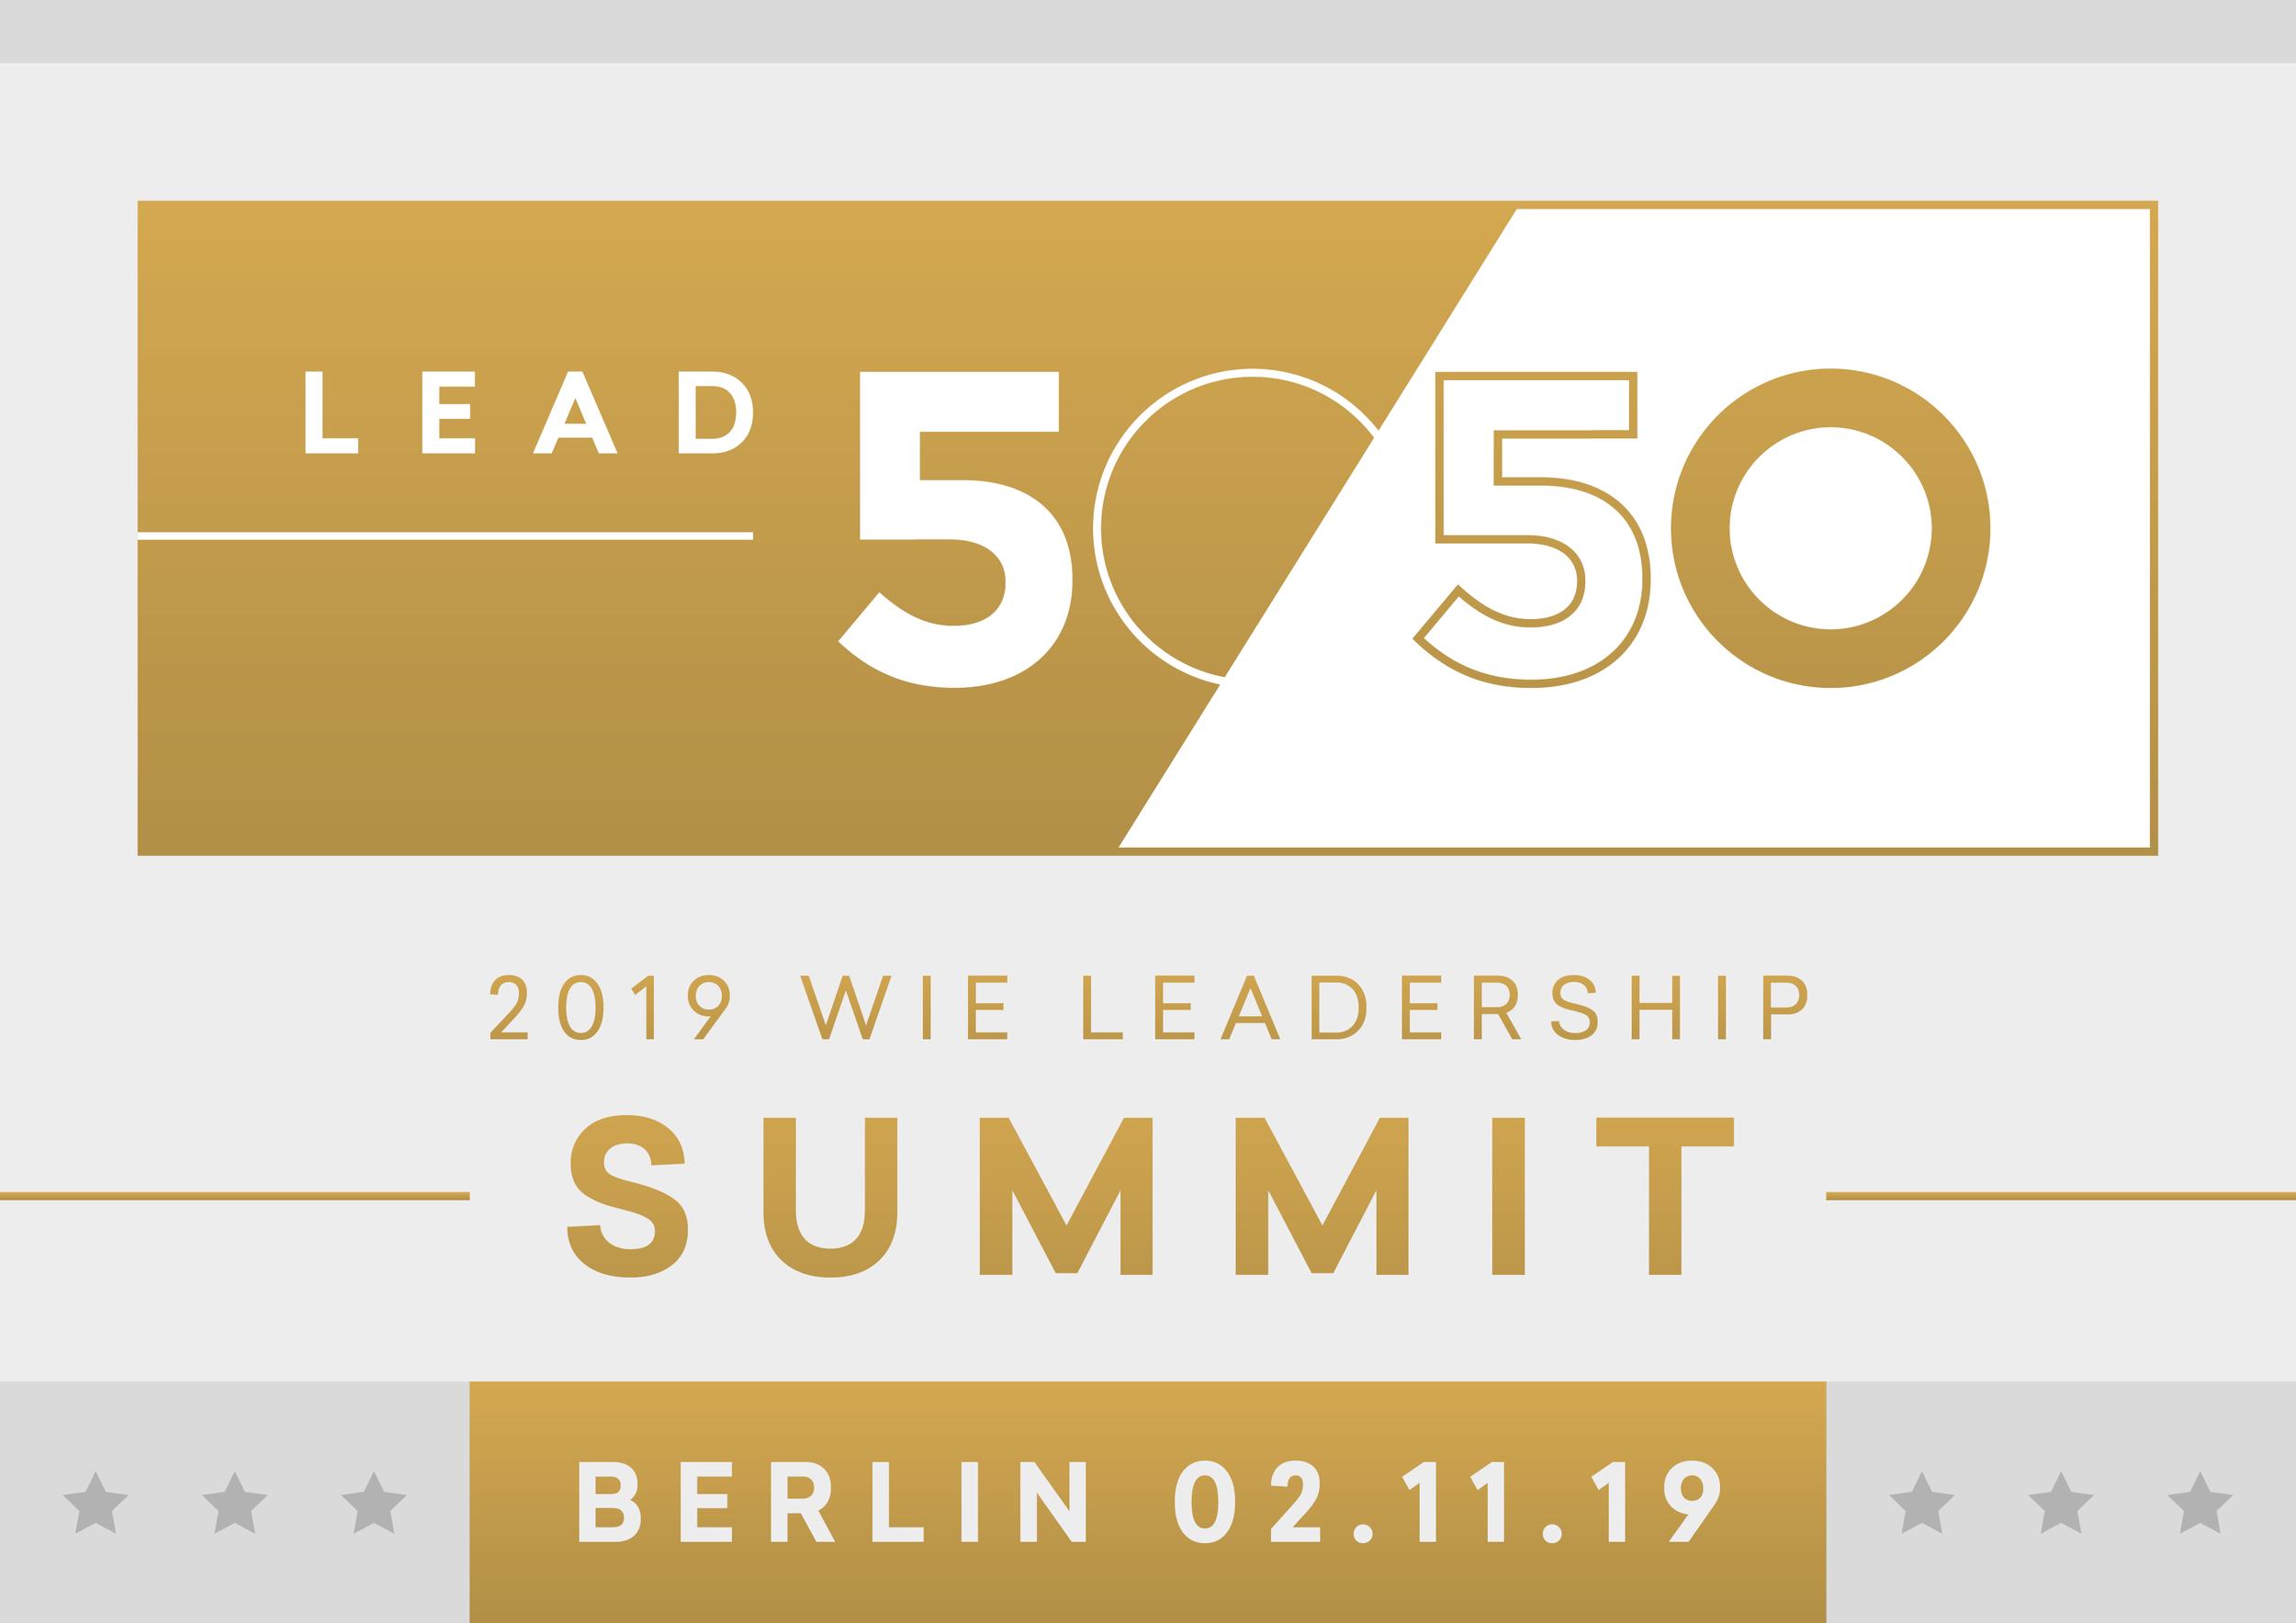 Lead5050_WIE_Summit_2019_Lrg.png